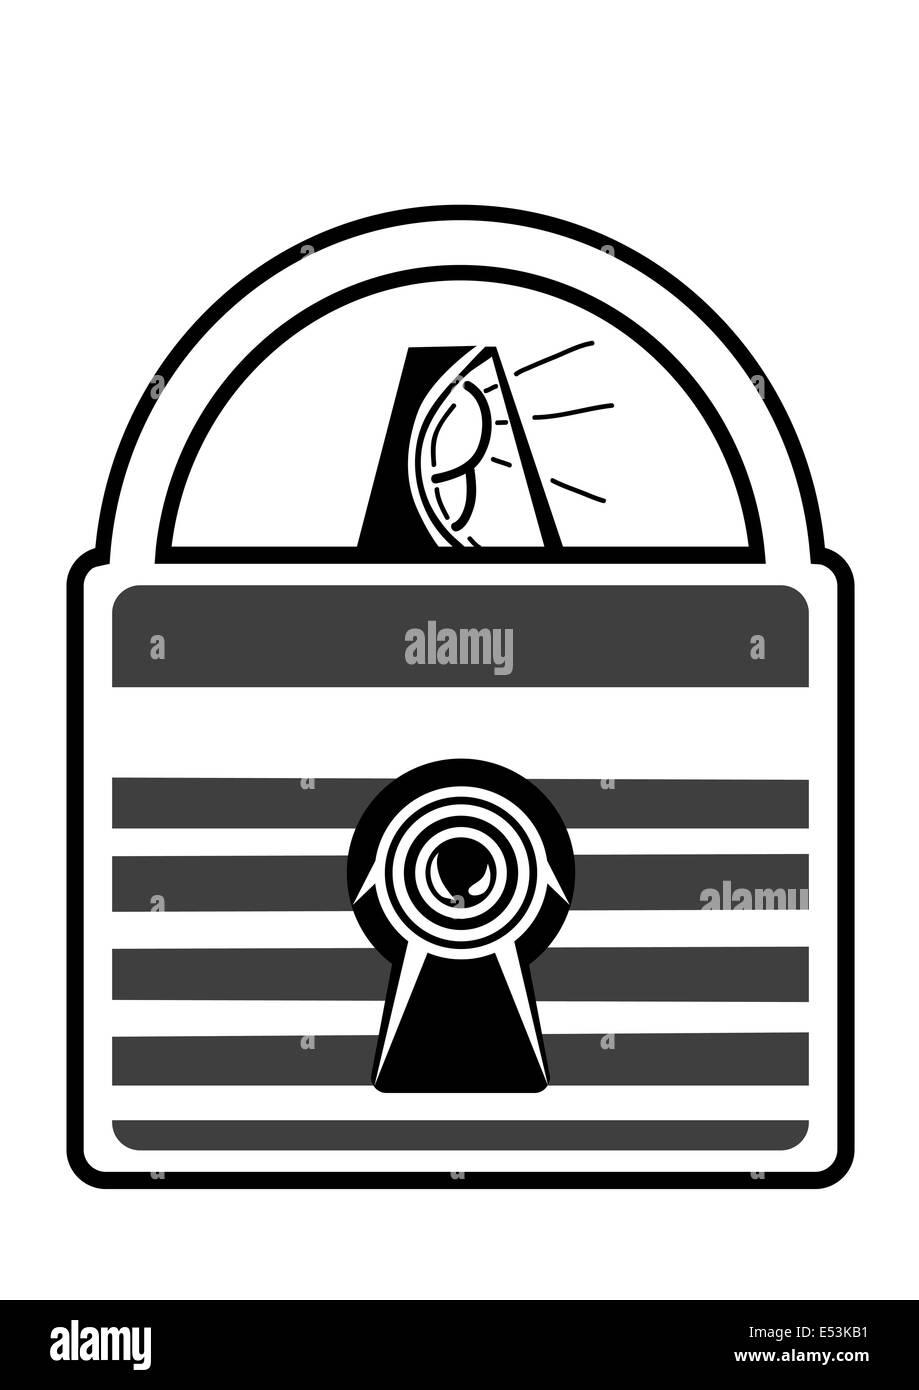 lock with alarm - Stock Image